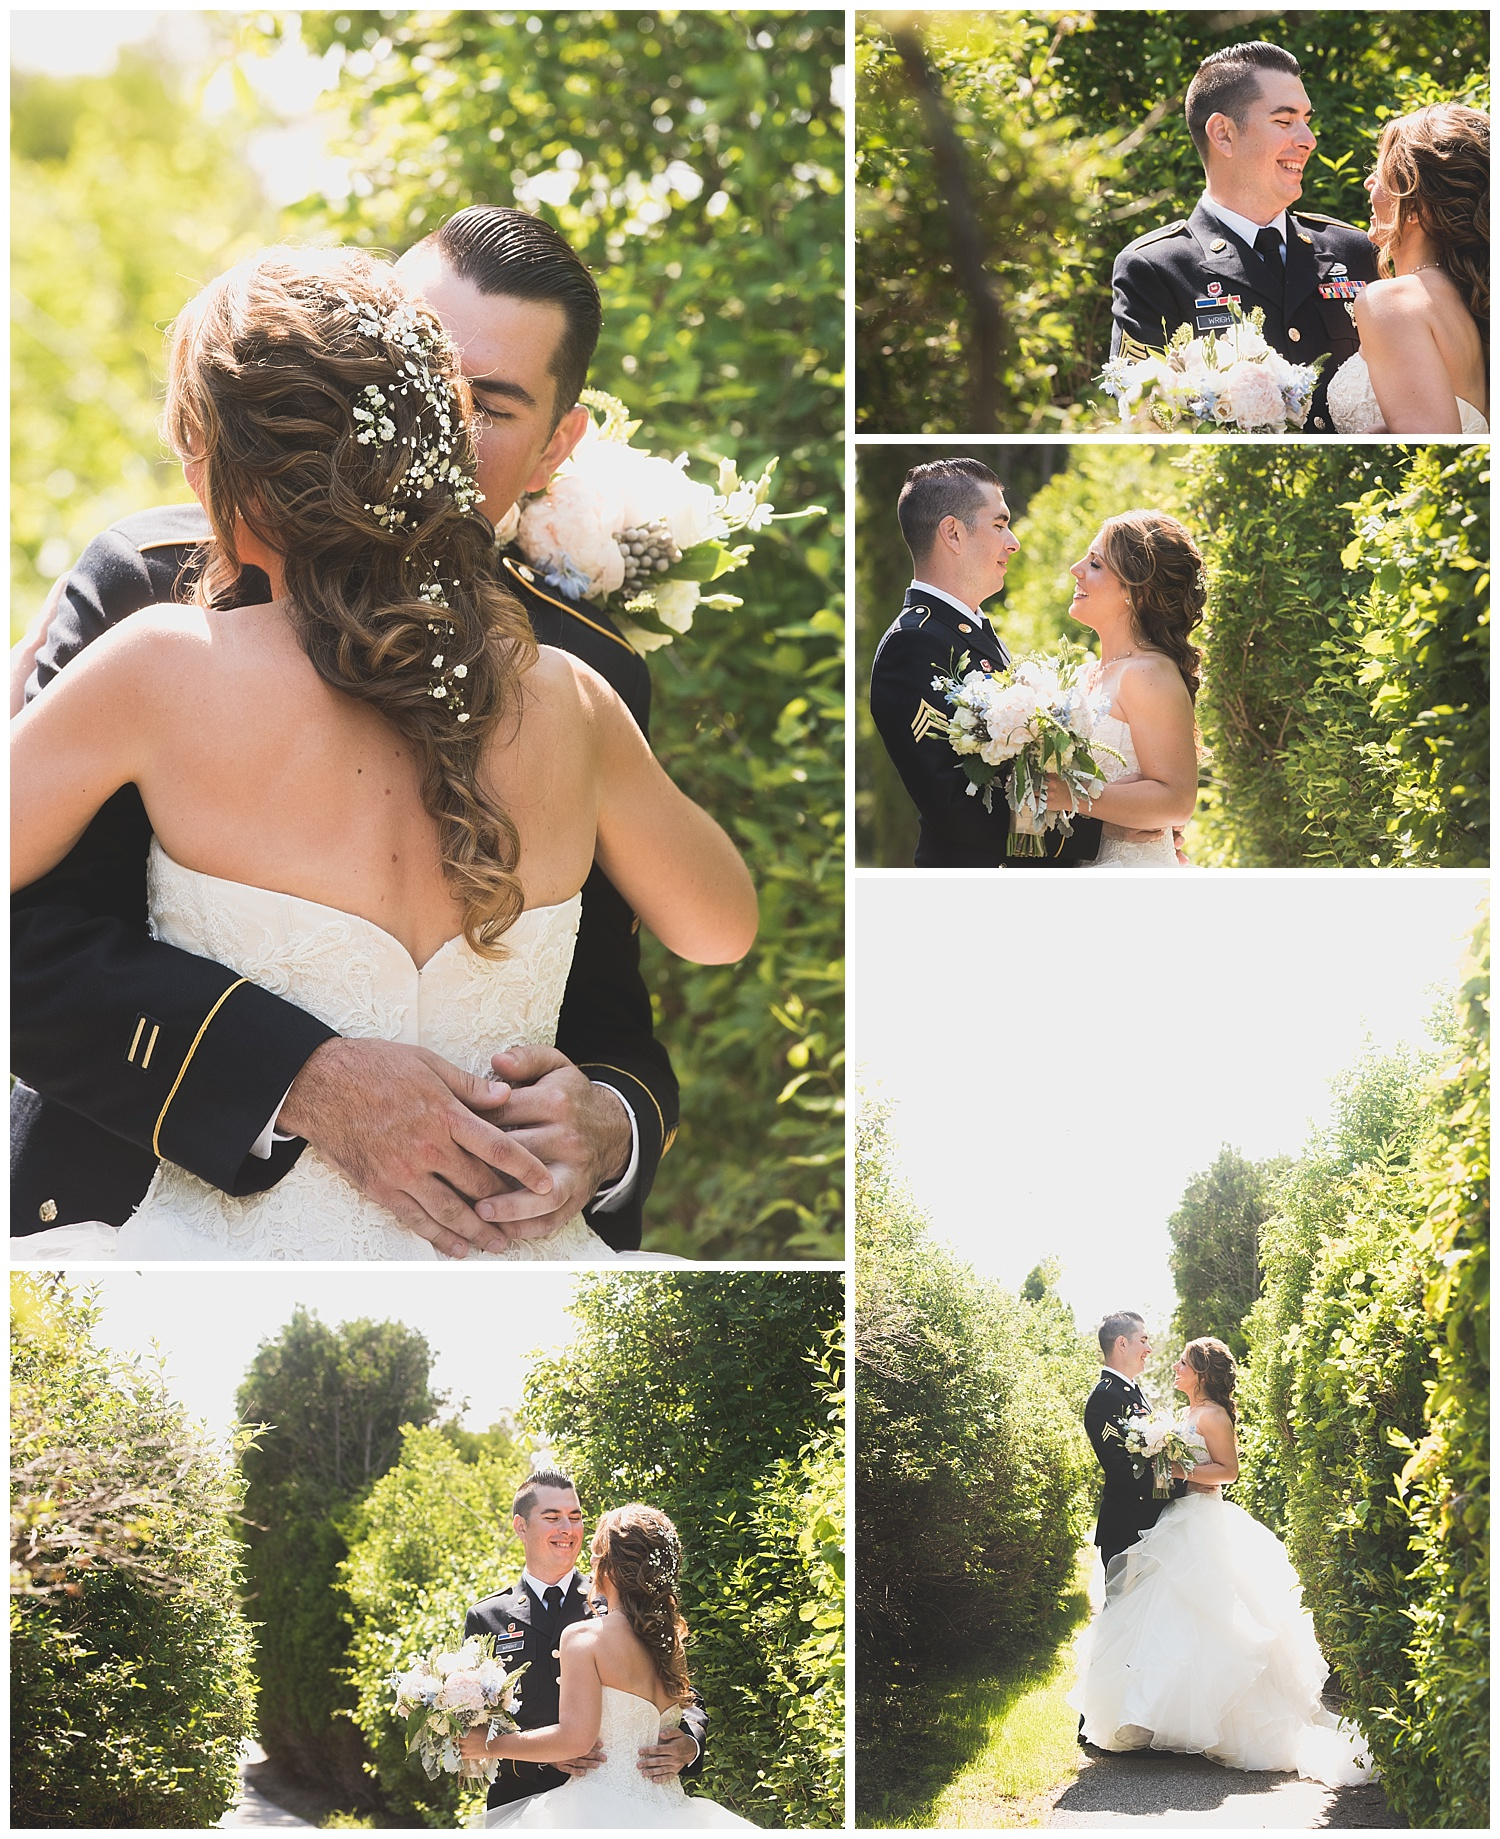 Beachmere Inn Wedding Photography_0035.jpg